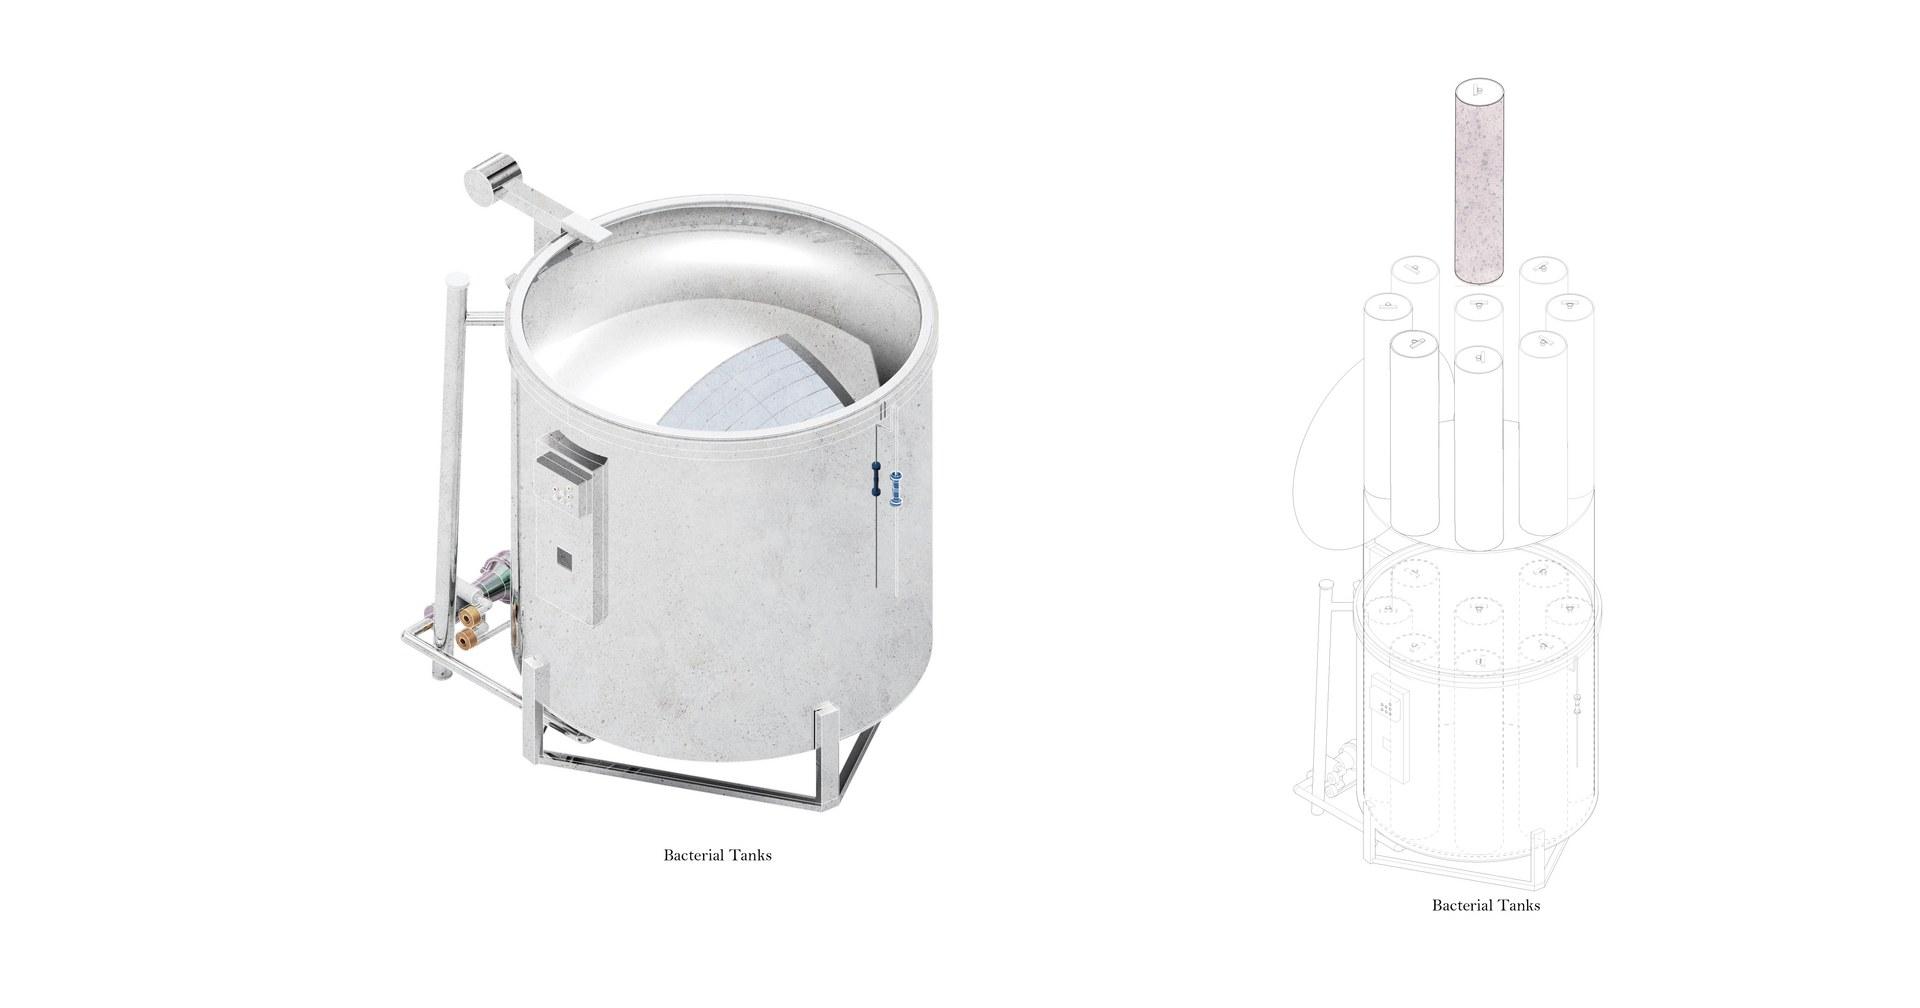 Machine (incubation tank)